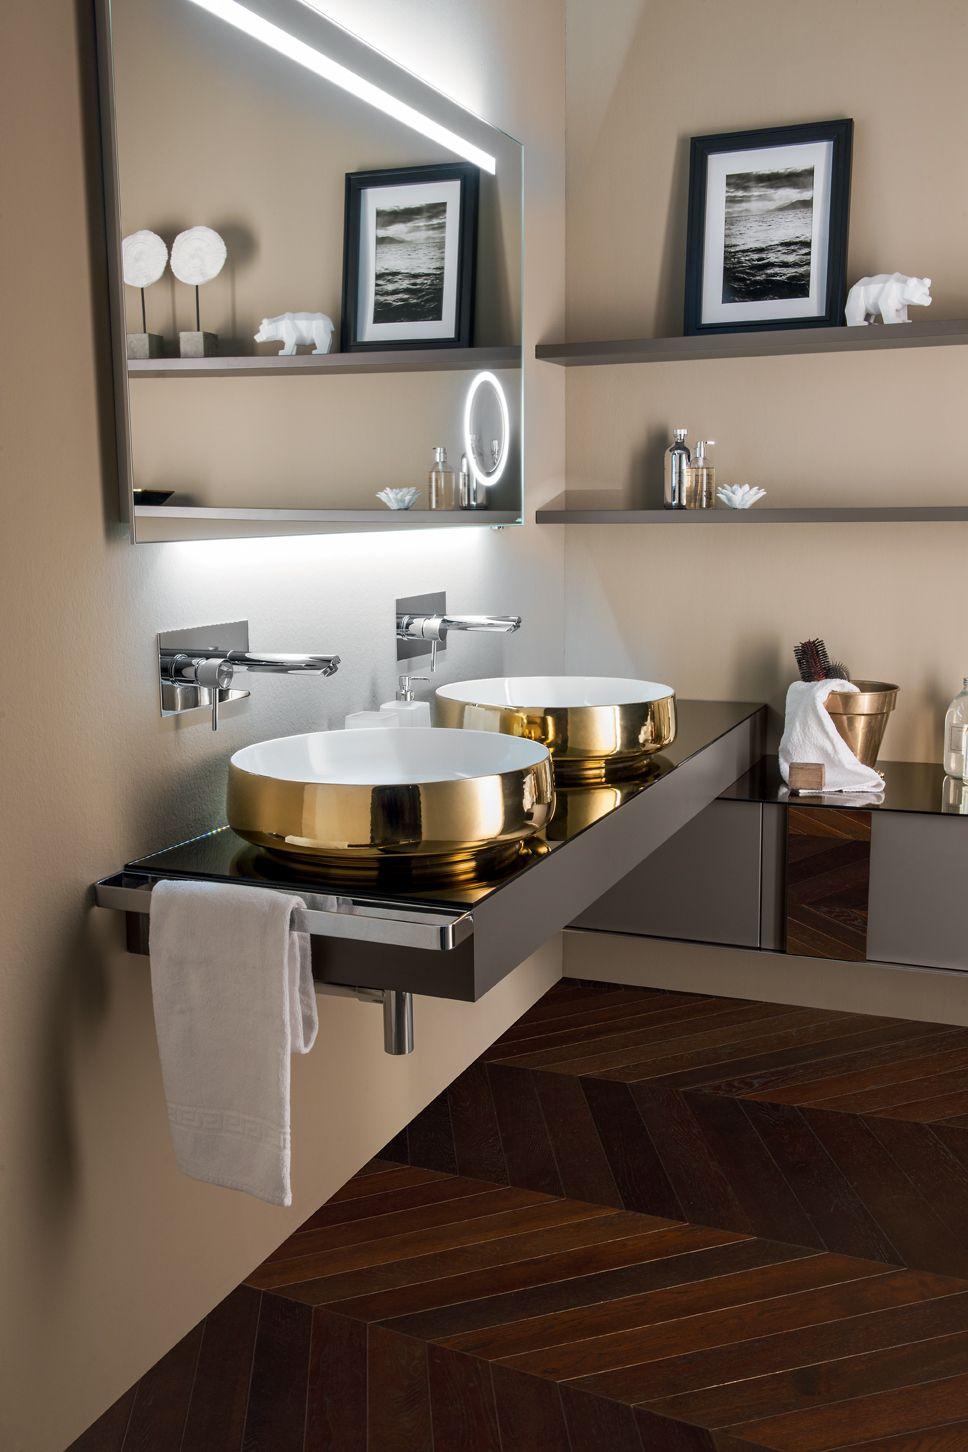 Sectional vanity unit QAMAR - Composizione 2 Qamar Collection By INDA� design Sergio Brioschi